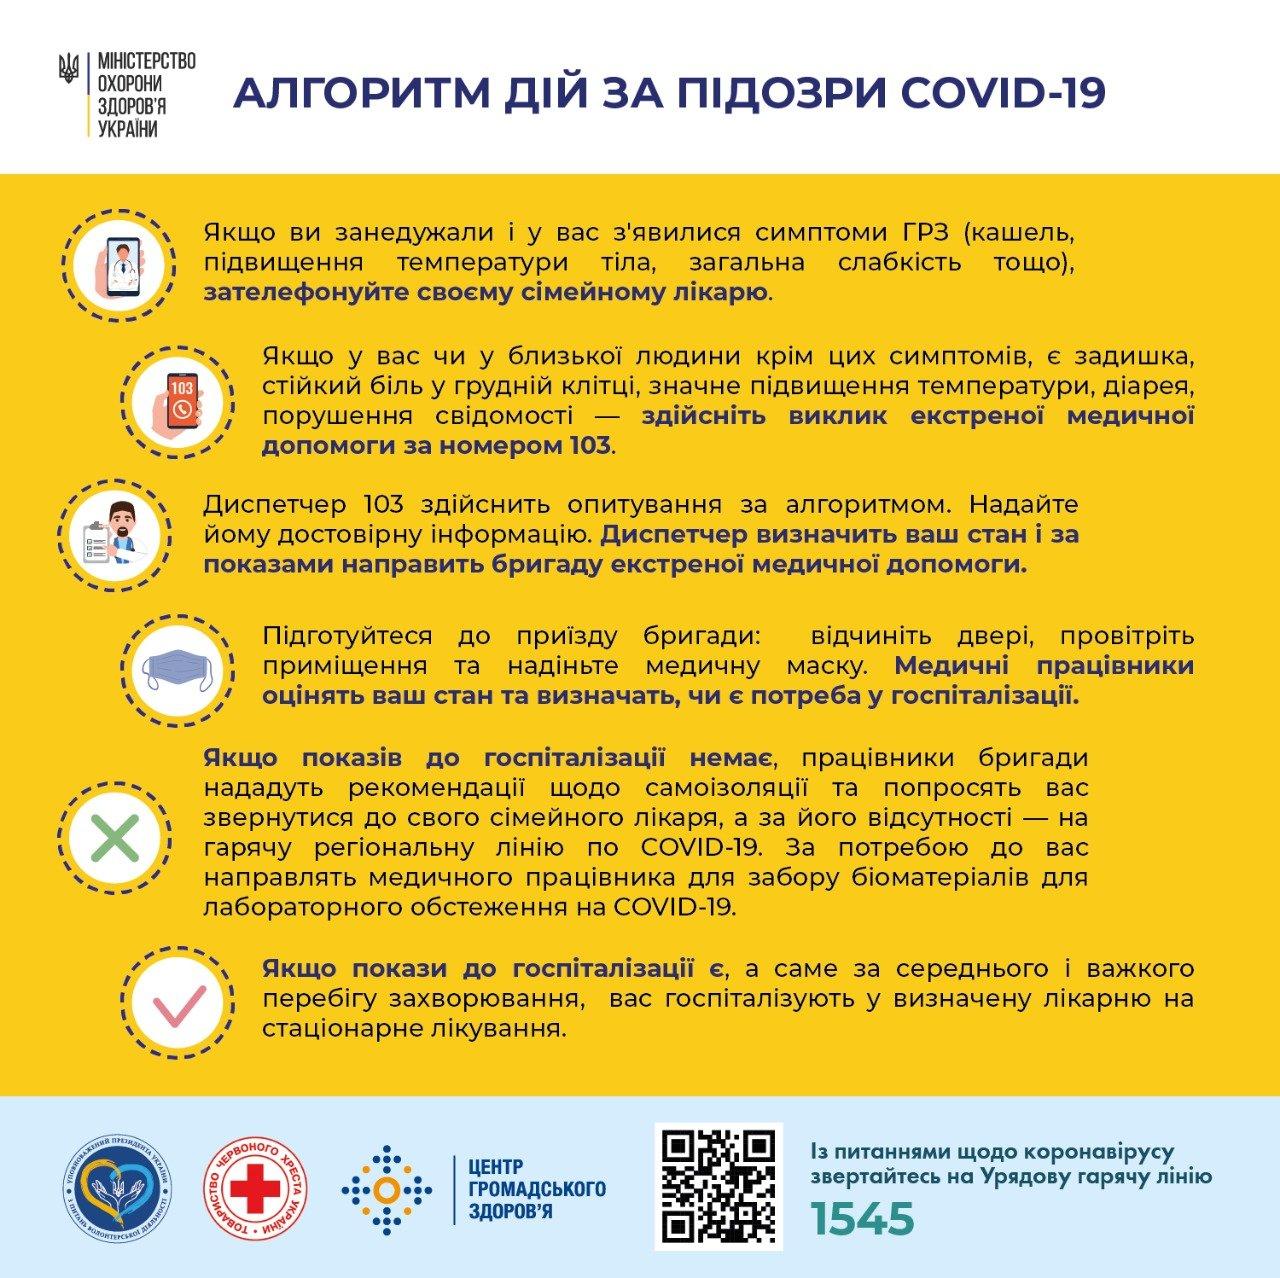 Коронавирус в Киеве: статистика заболеваемости на 25 октября, фото-2